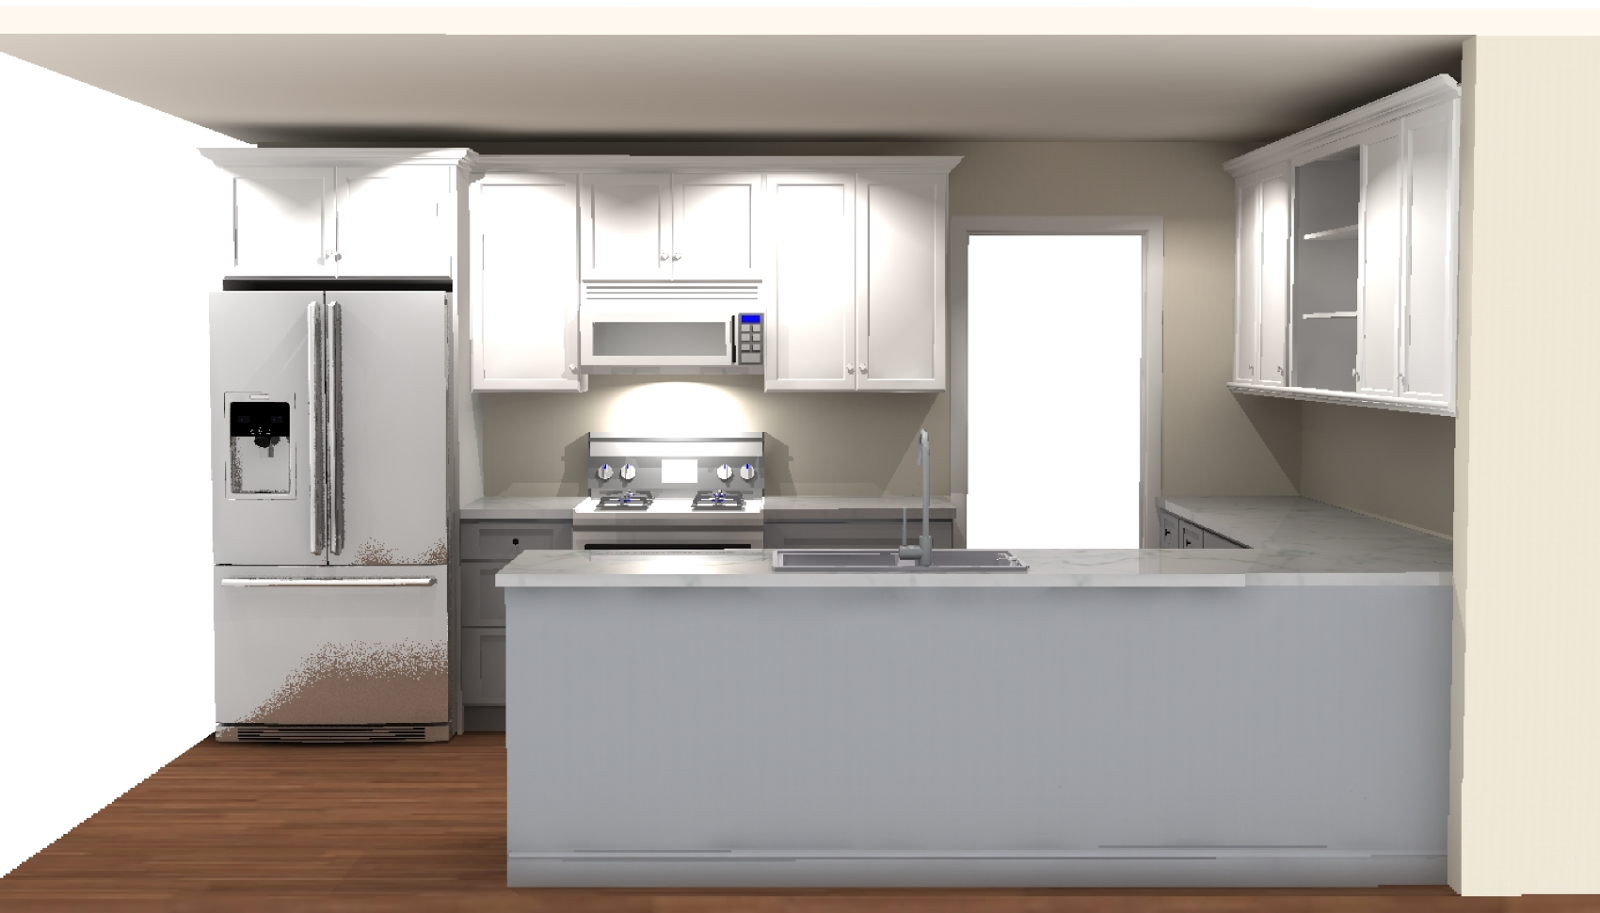 installing upper kitchen cabinets upper kitchen cabinets Installing Upper Kitchen Cabinets PBJstories